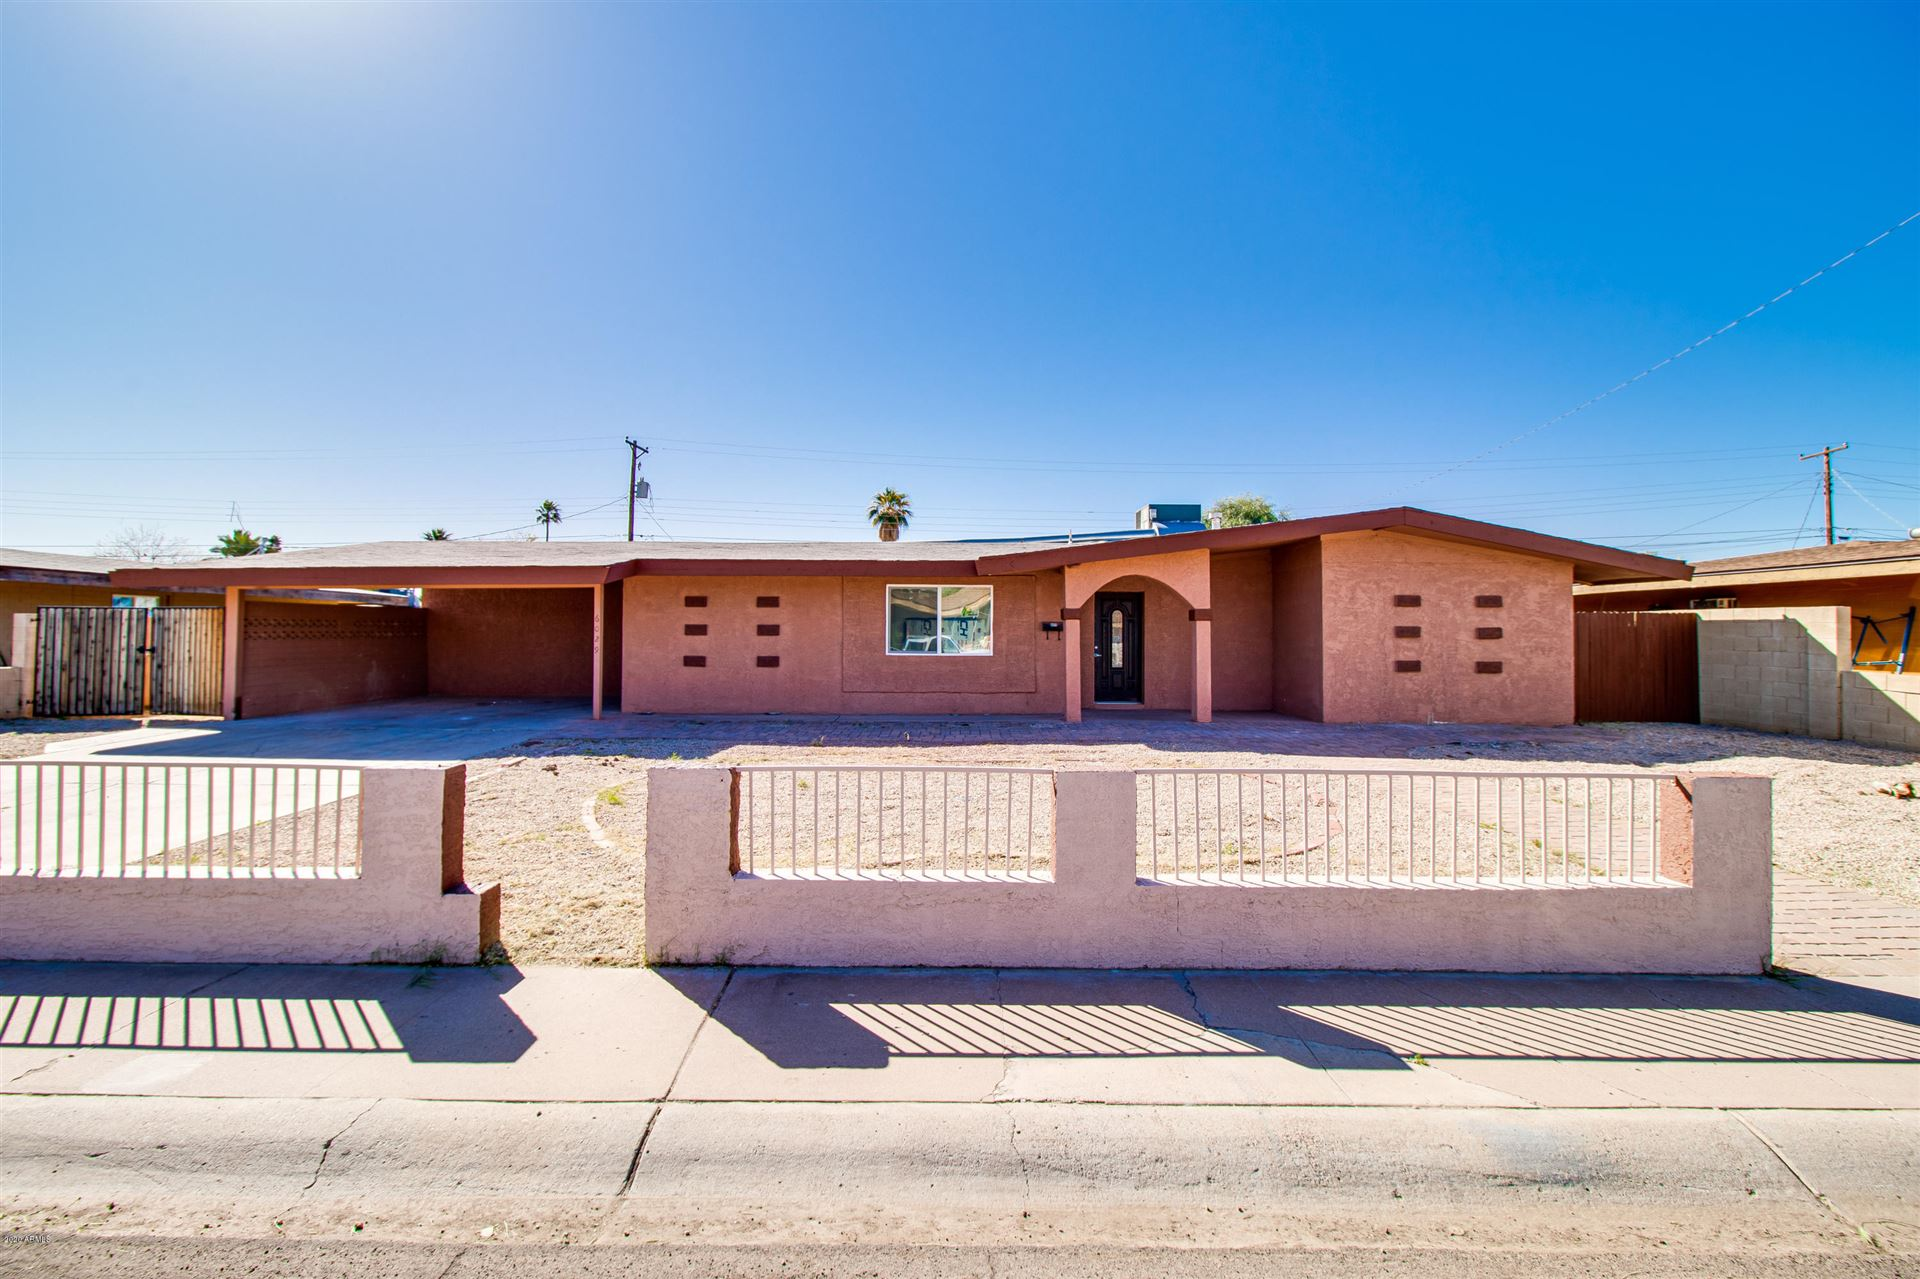 6029 W INDIANOLA Avenue, Phoenix, AZ 85033 - MLS#: 6042668